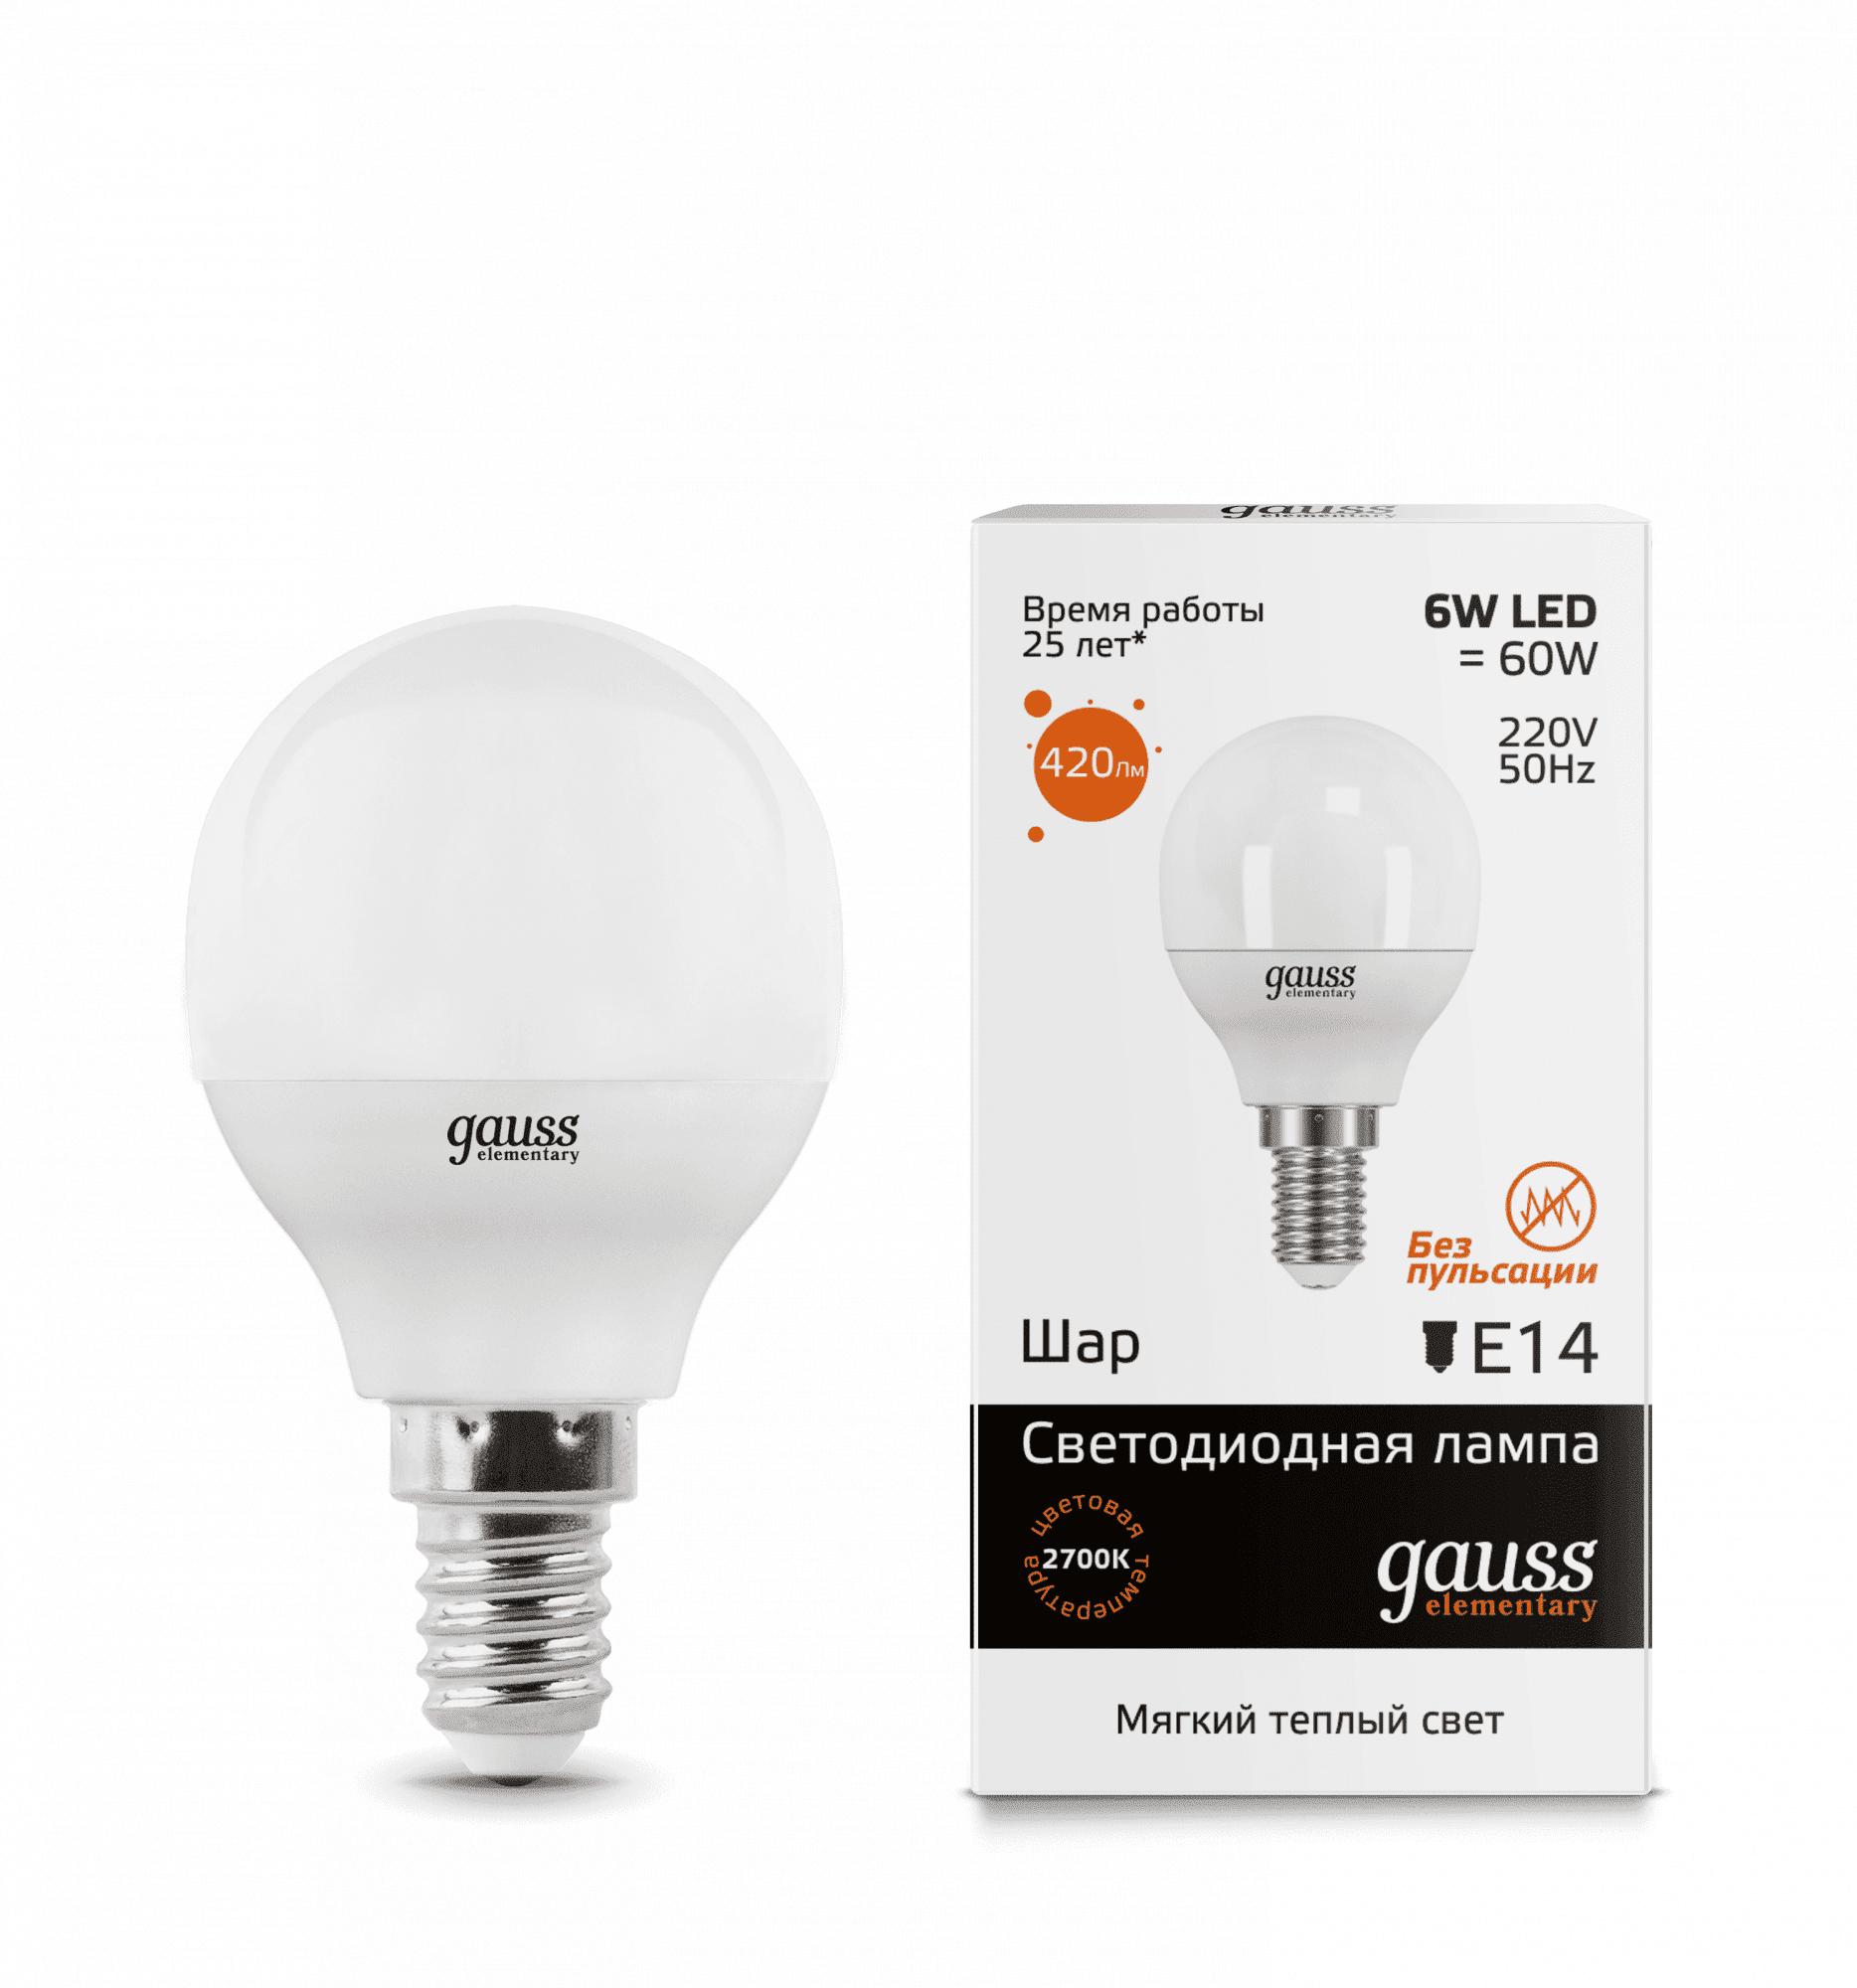 Gauss LED Elementary Globe 6W E14 2700K 1/10/50 арт. 53116